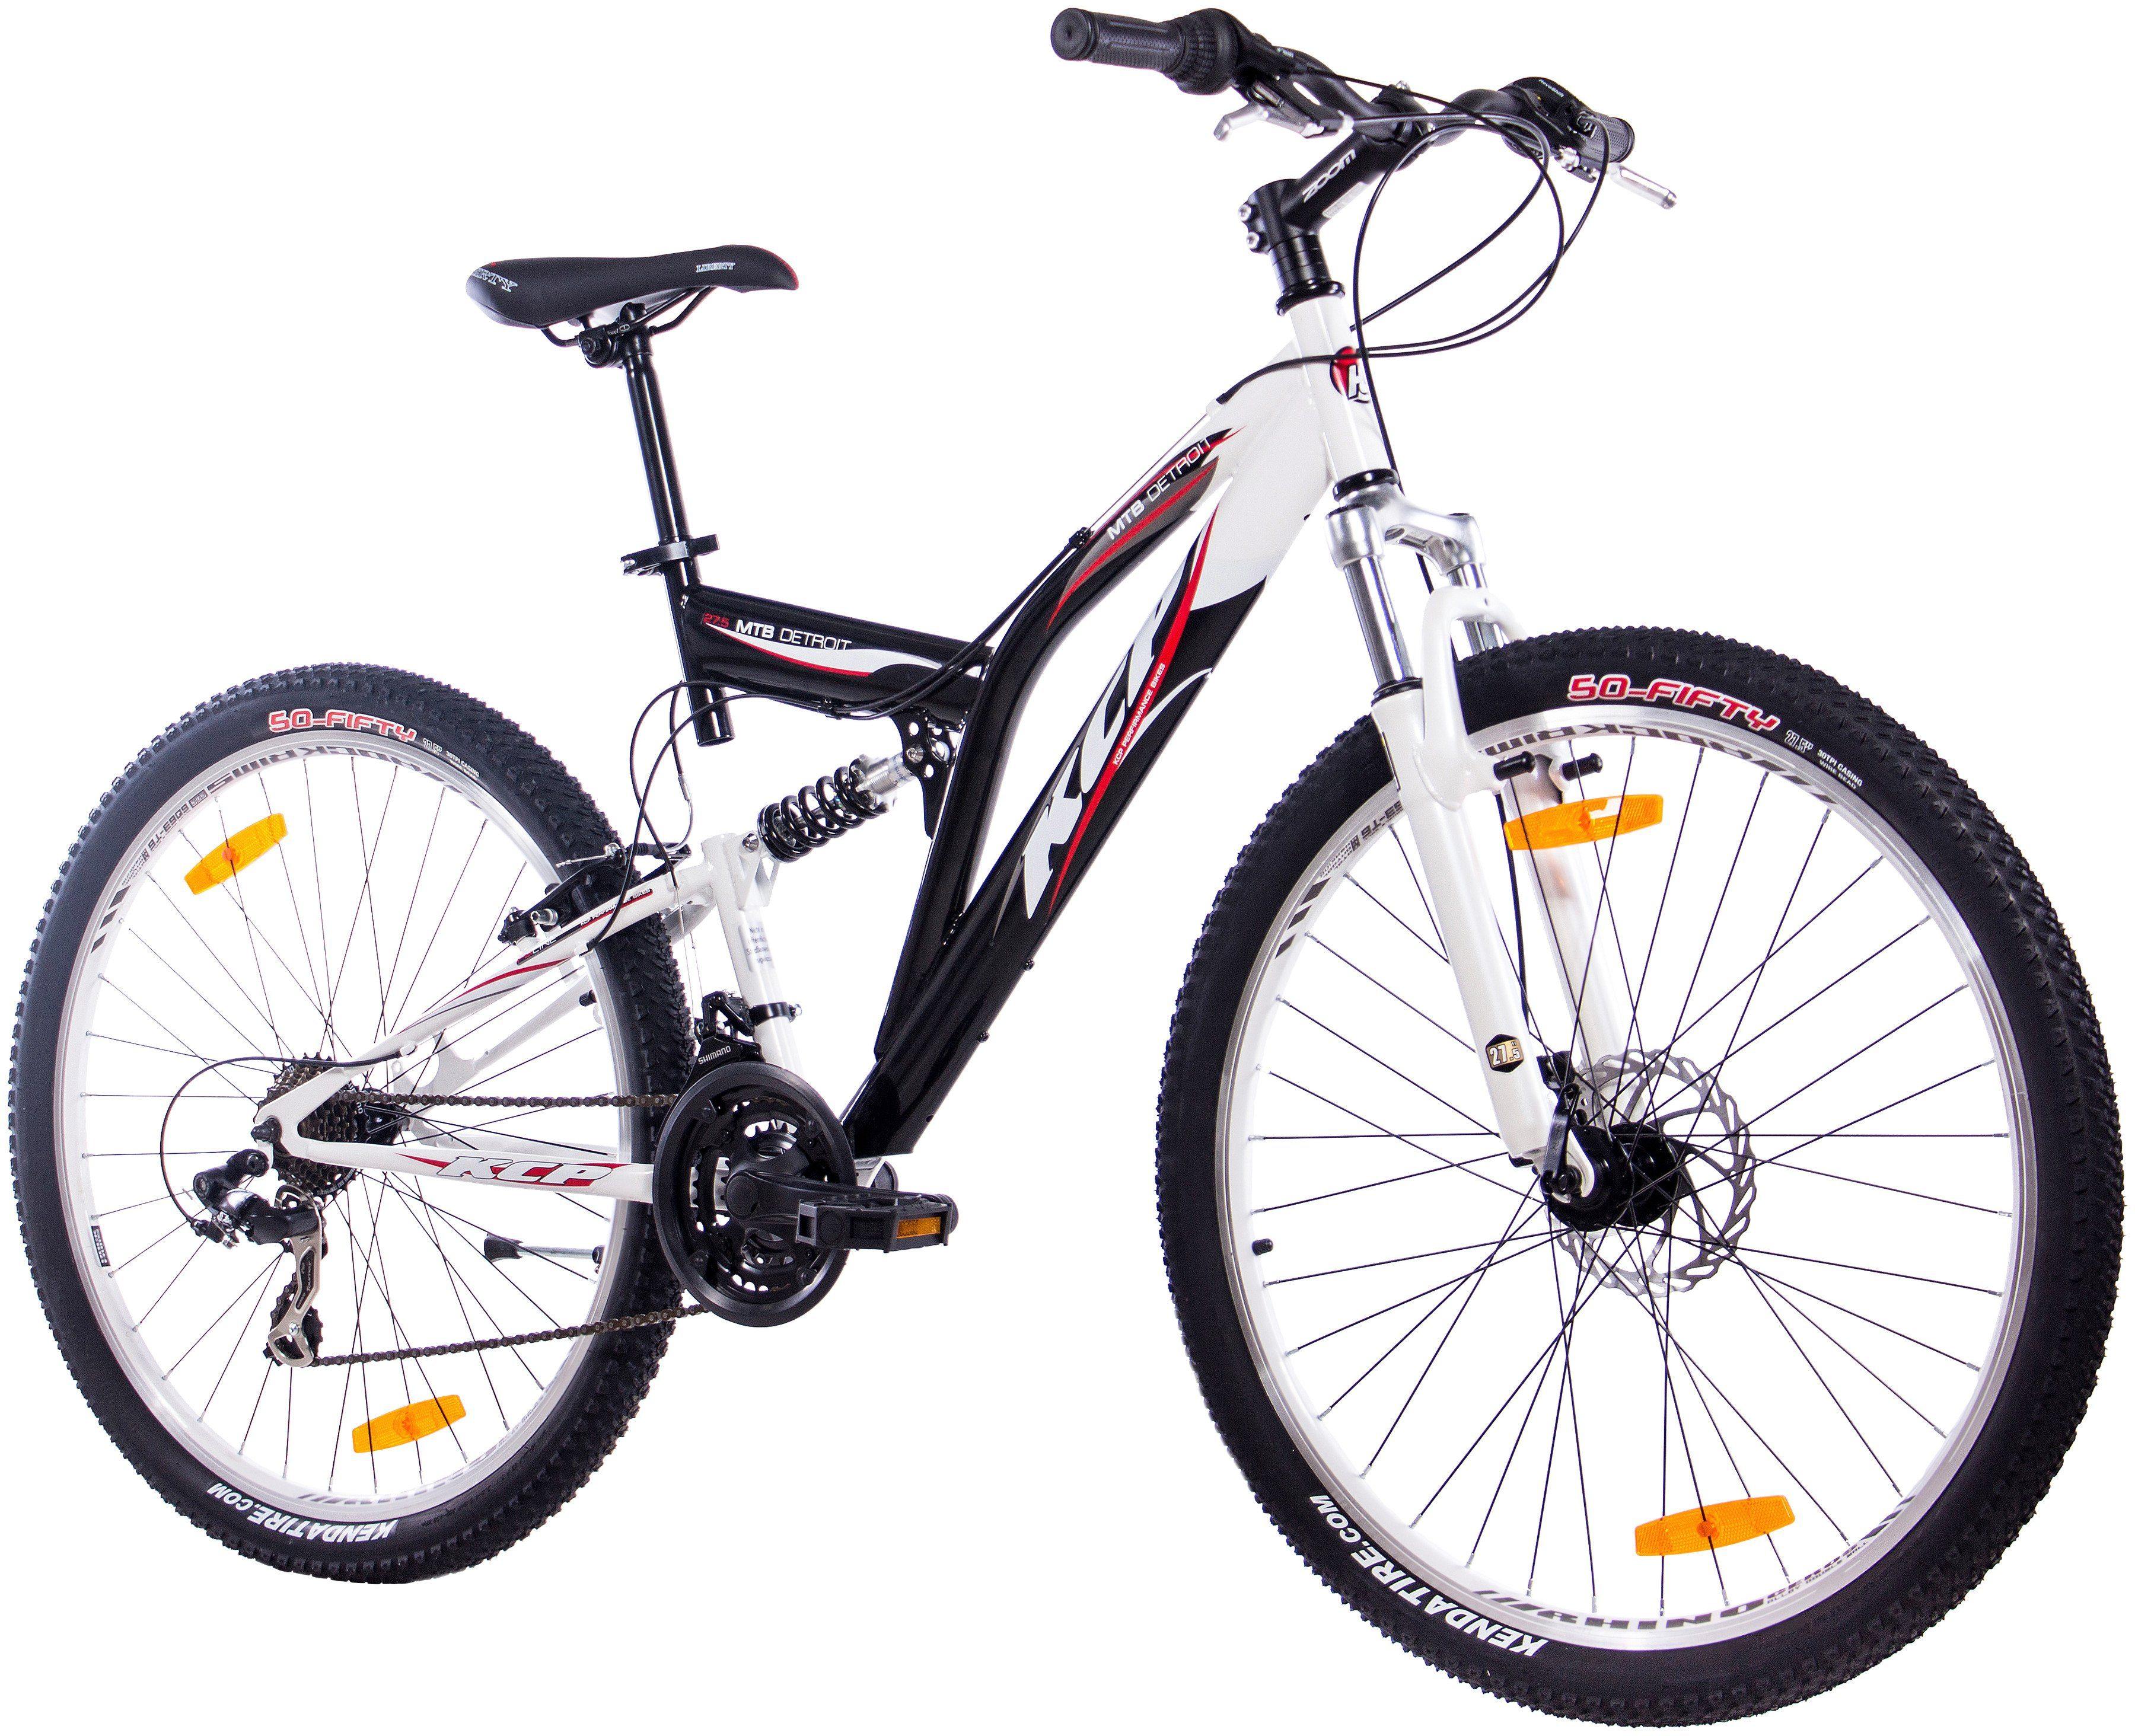 Fully-Mountainbike »DETROIT schwarz-weiß, 70 cm (27,5 Zoll)«